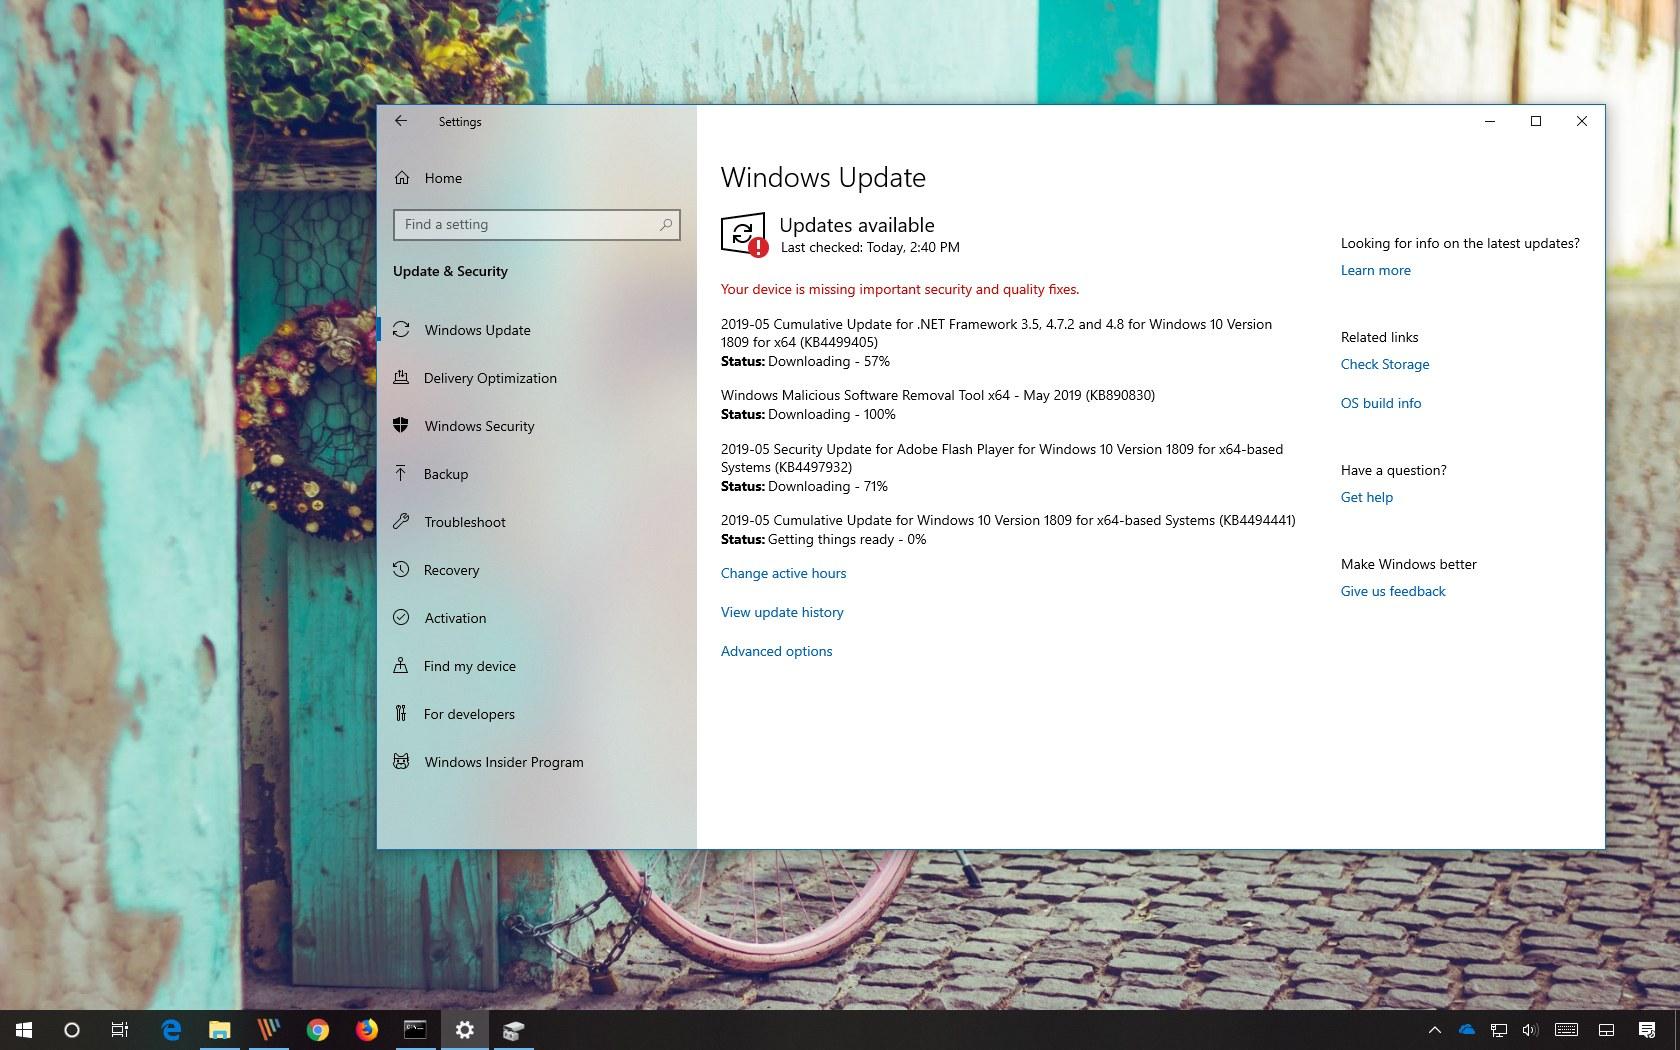 KB4494441 update for Windows 10